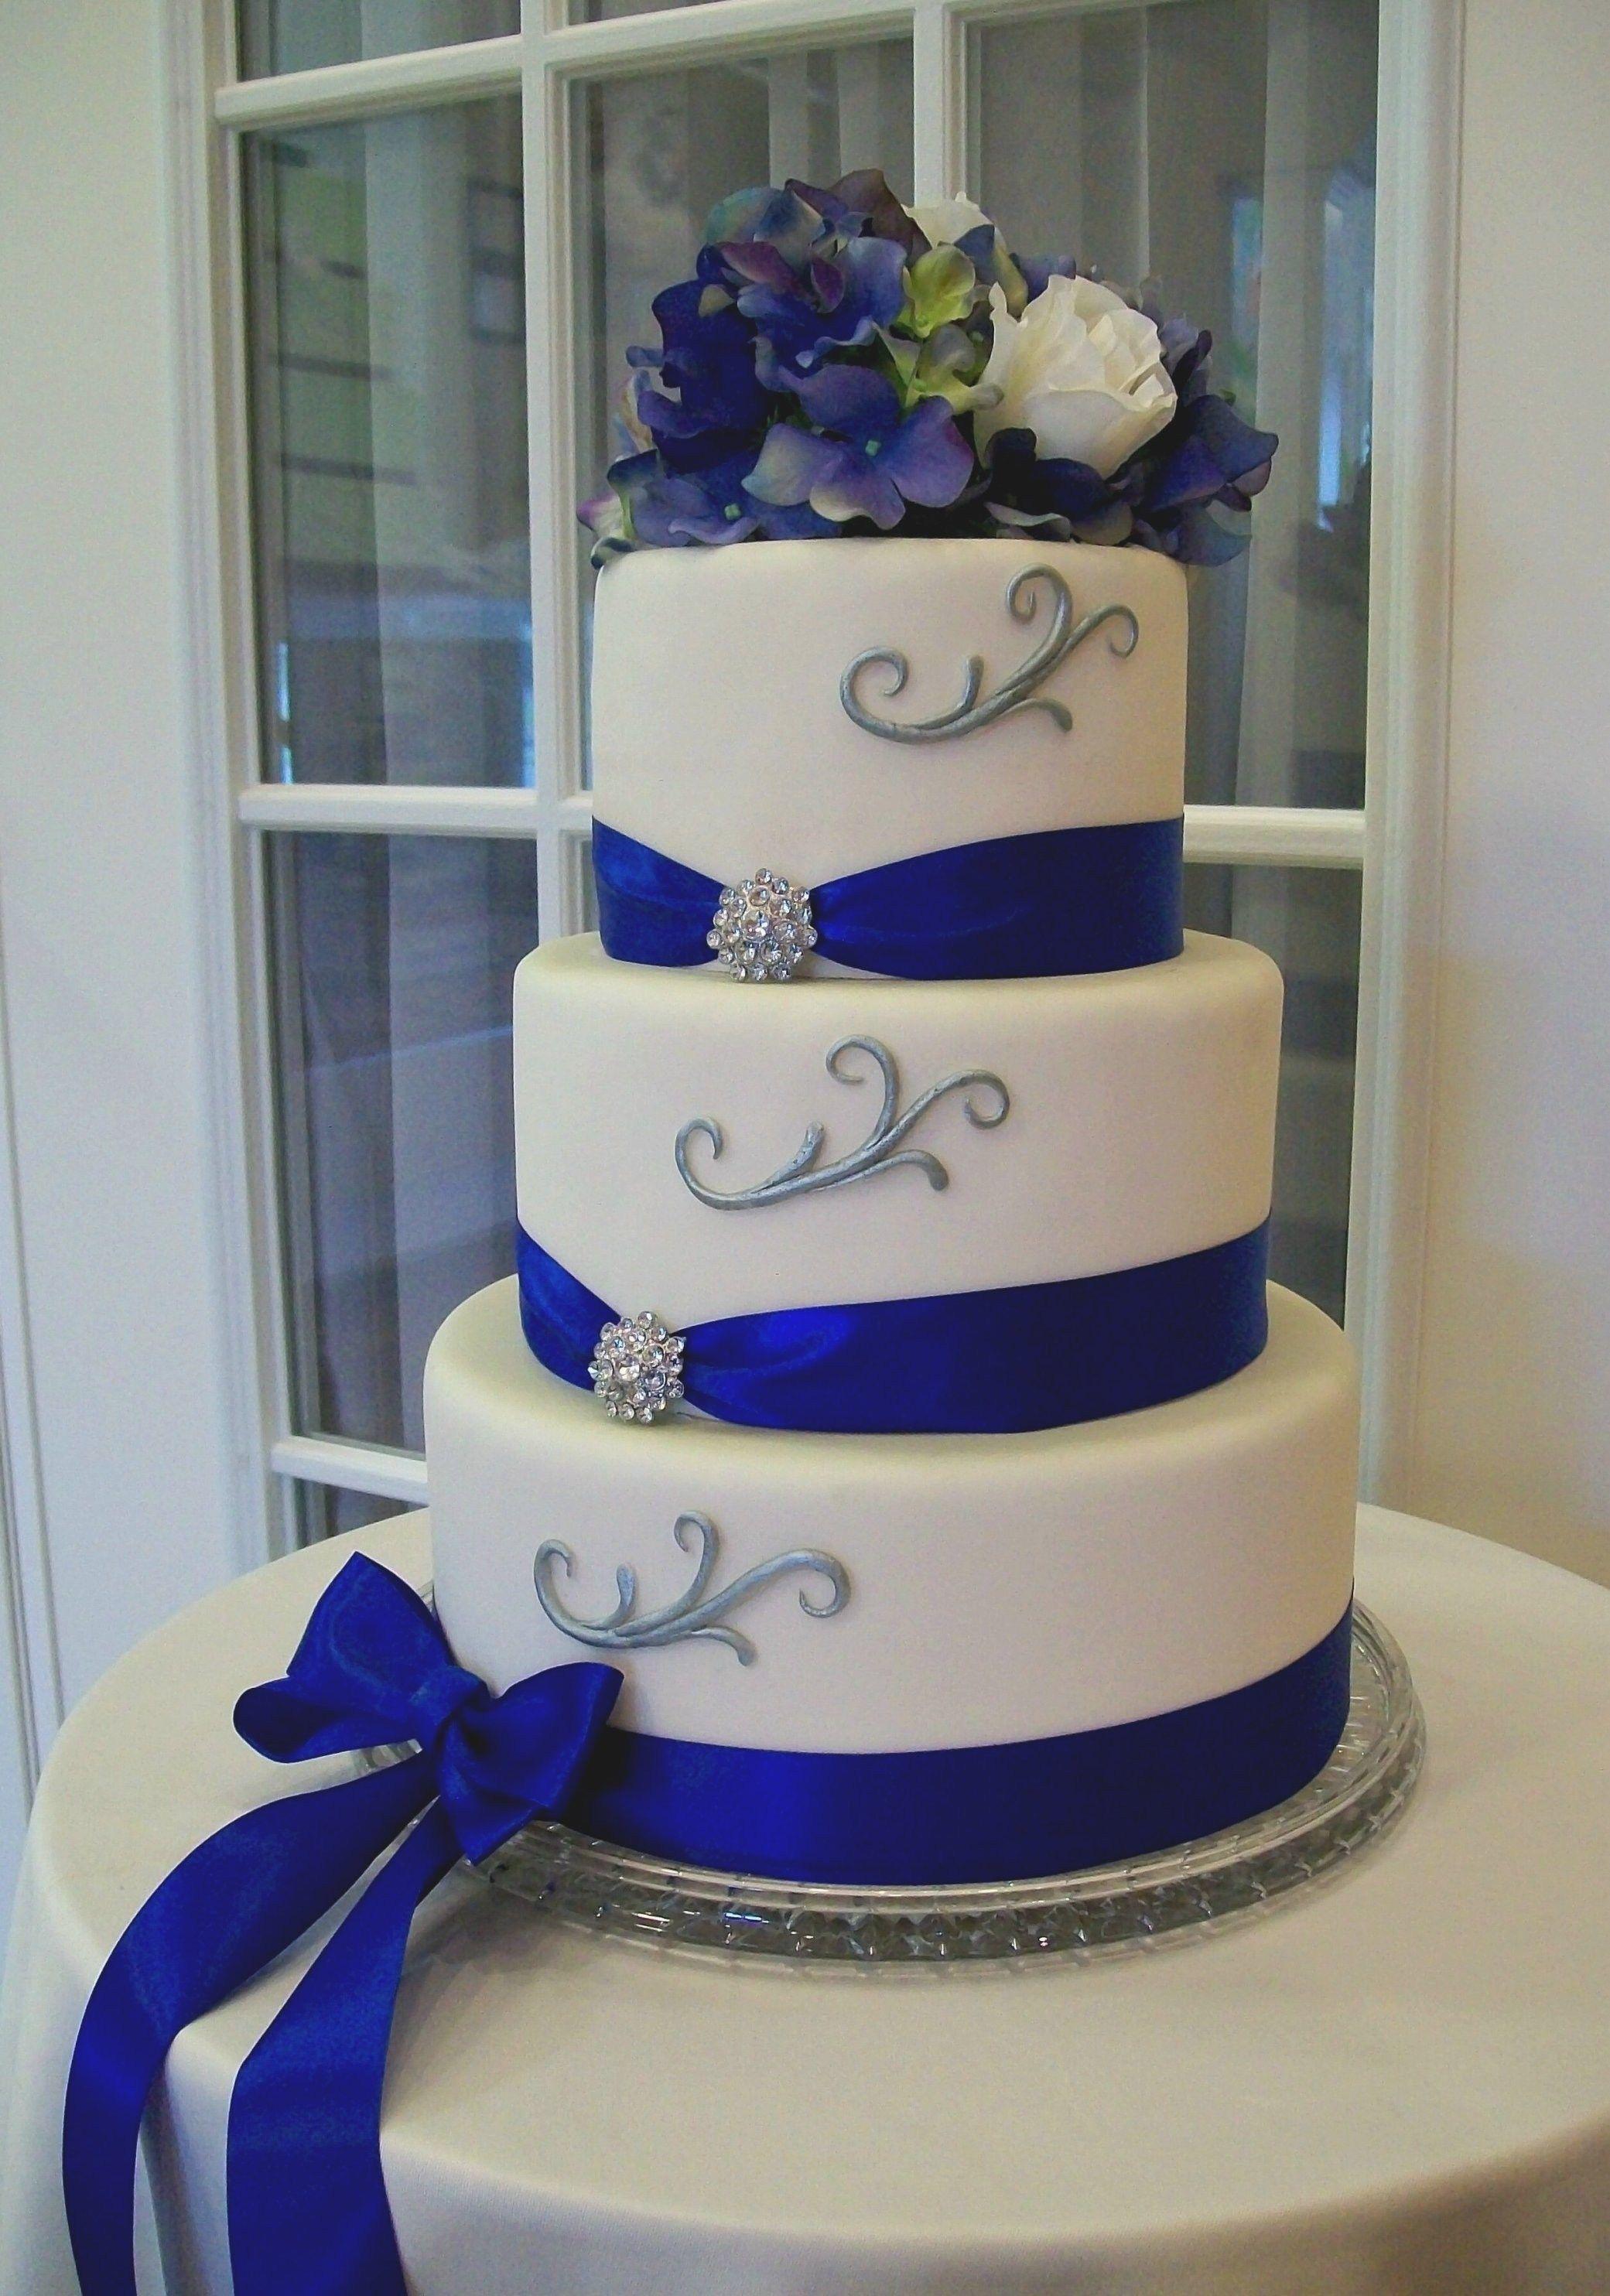 Wedding Cakes Blue And Silver Wedding Party Decoration Regarding